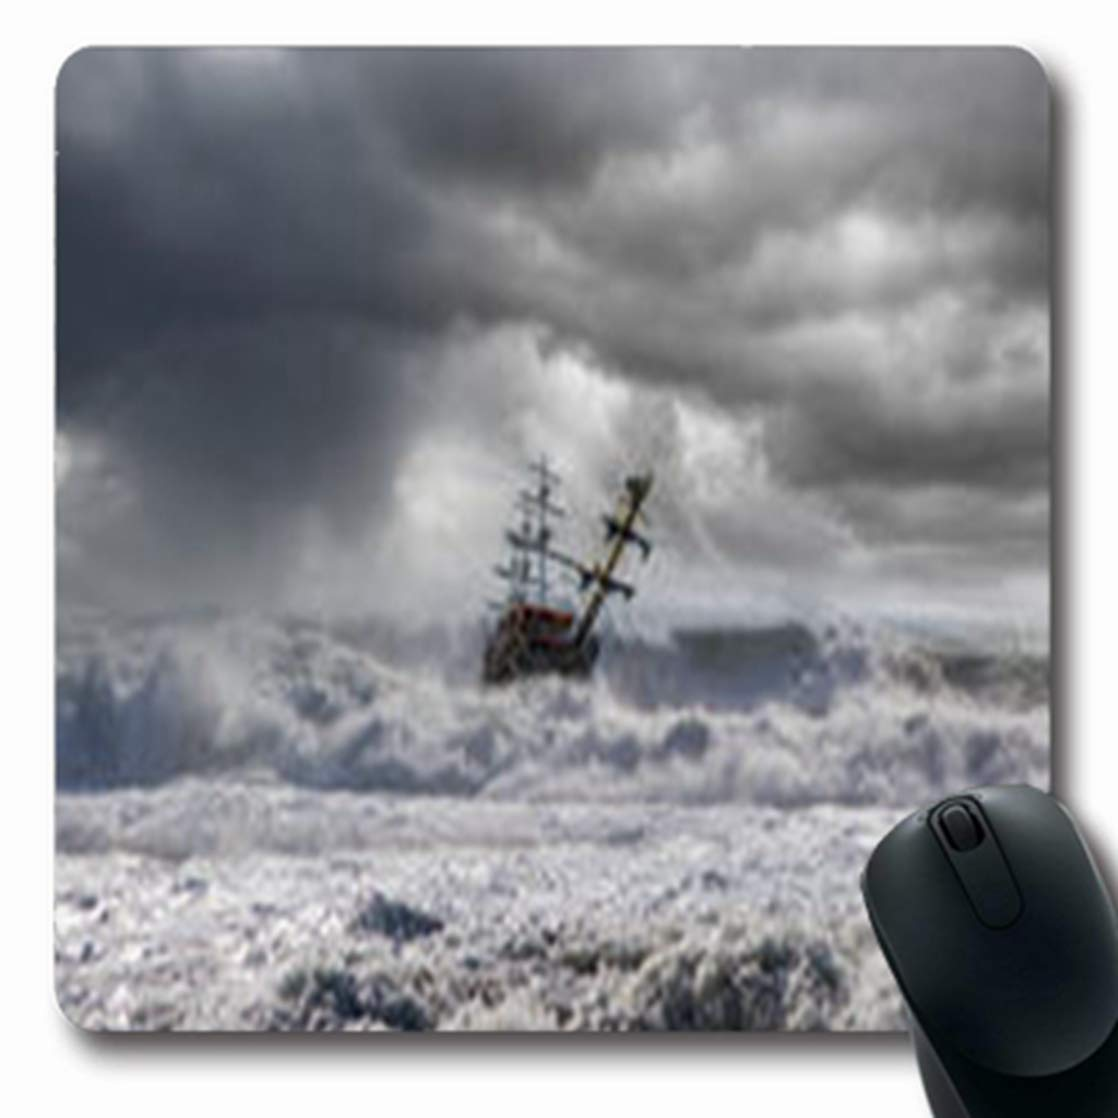 Pandarllin マウスパッド 波 太陽 海 自然 日の出 エアパーク アウトドア 夏 楕円形 7.9 x 9.5インチ 長方形 ゲーム用マウスパッド 滑り止めゴムマット 7.9